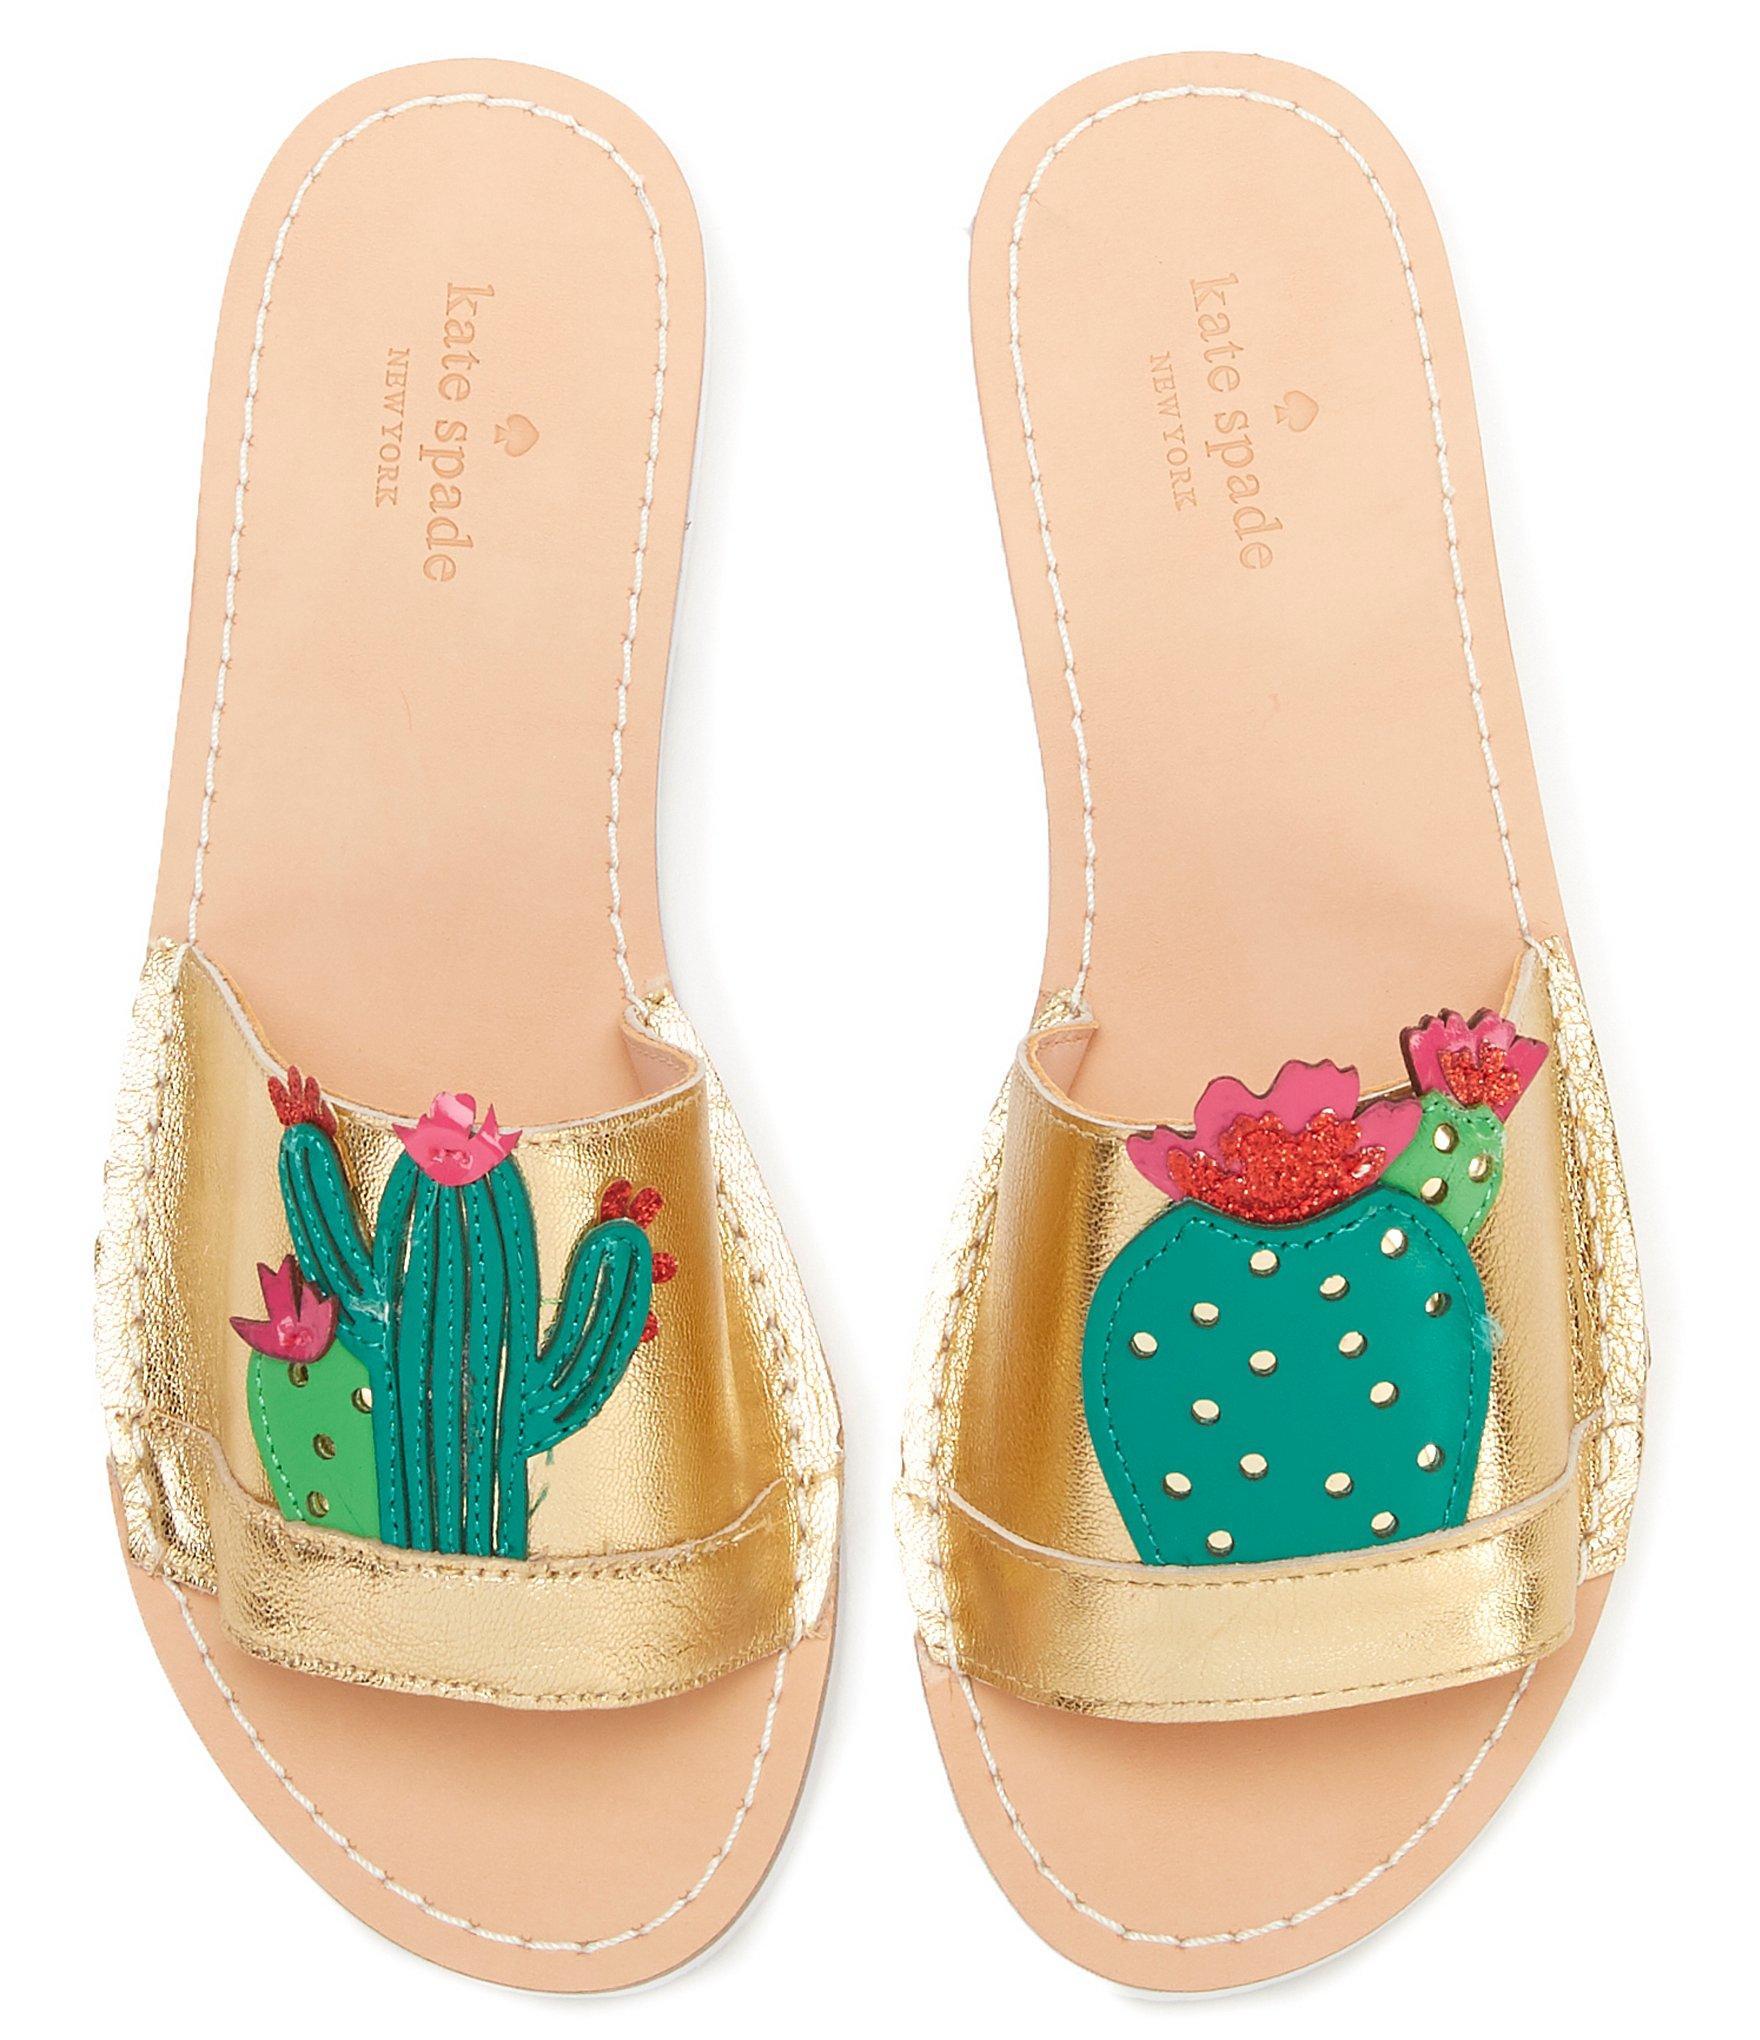 ecbb9fe1750f Lyst - Kate Spade Iguana Cactus Slide Sandals in Metallic